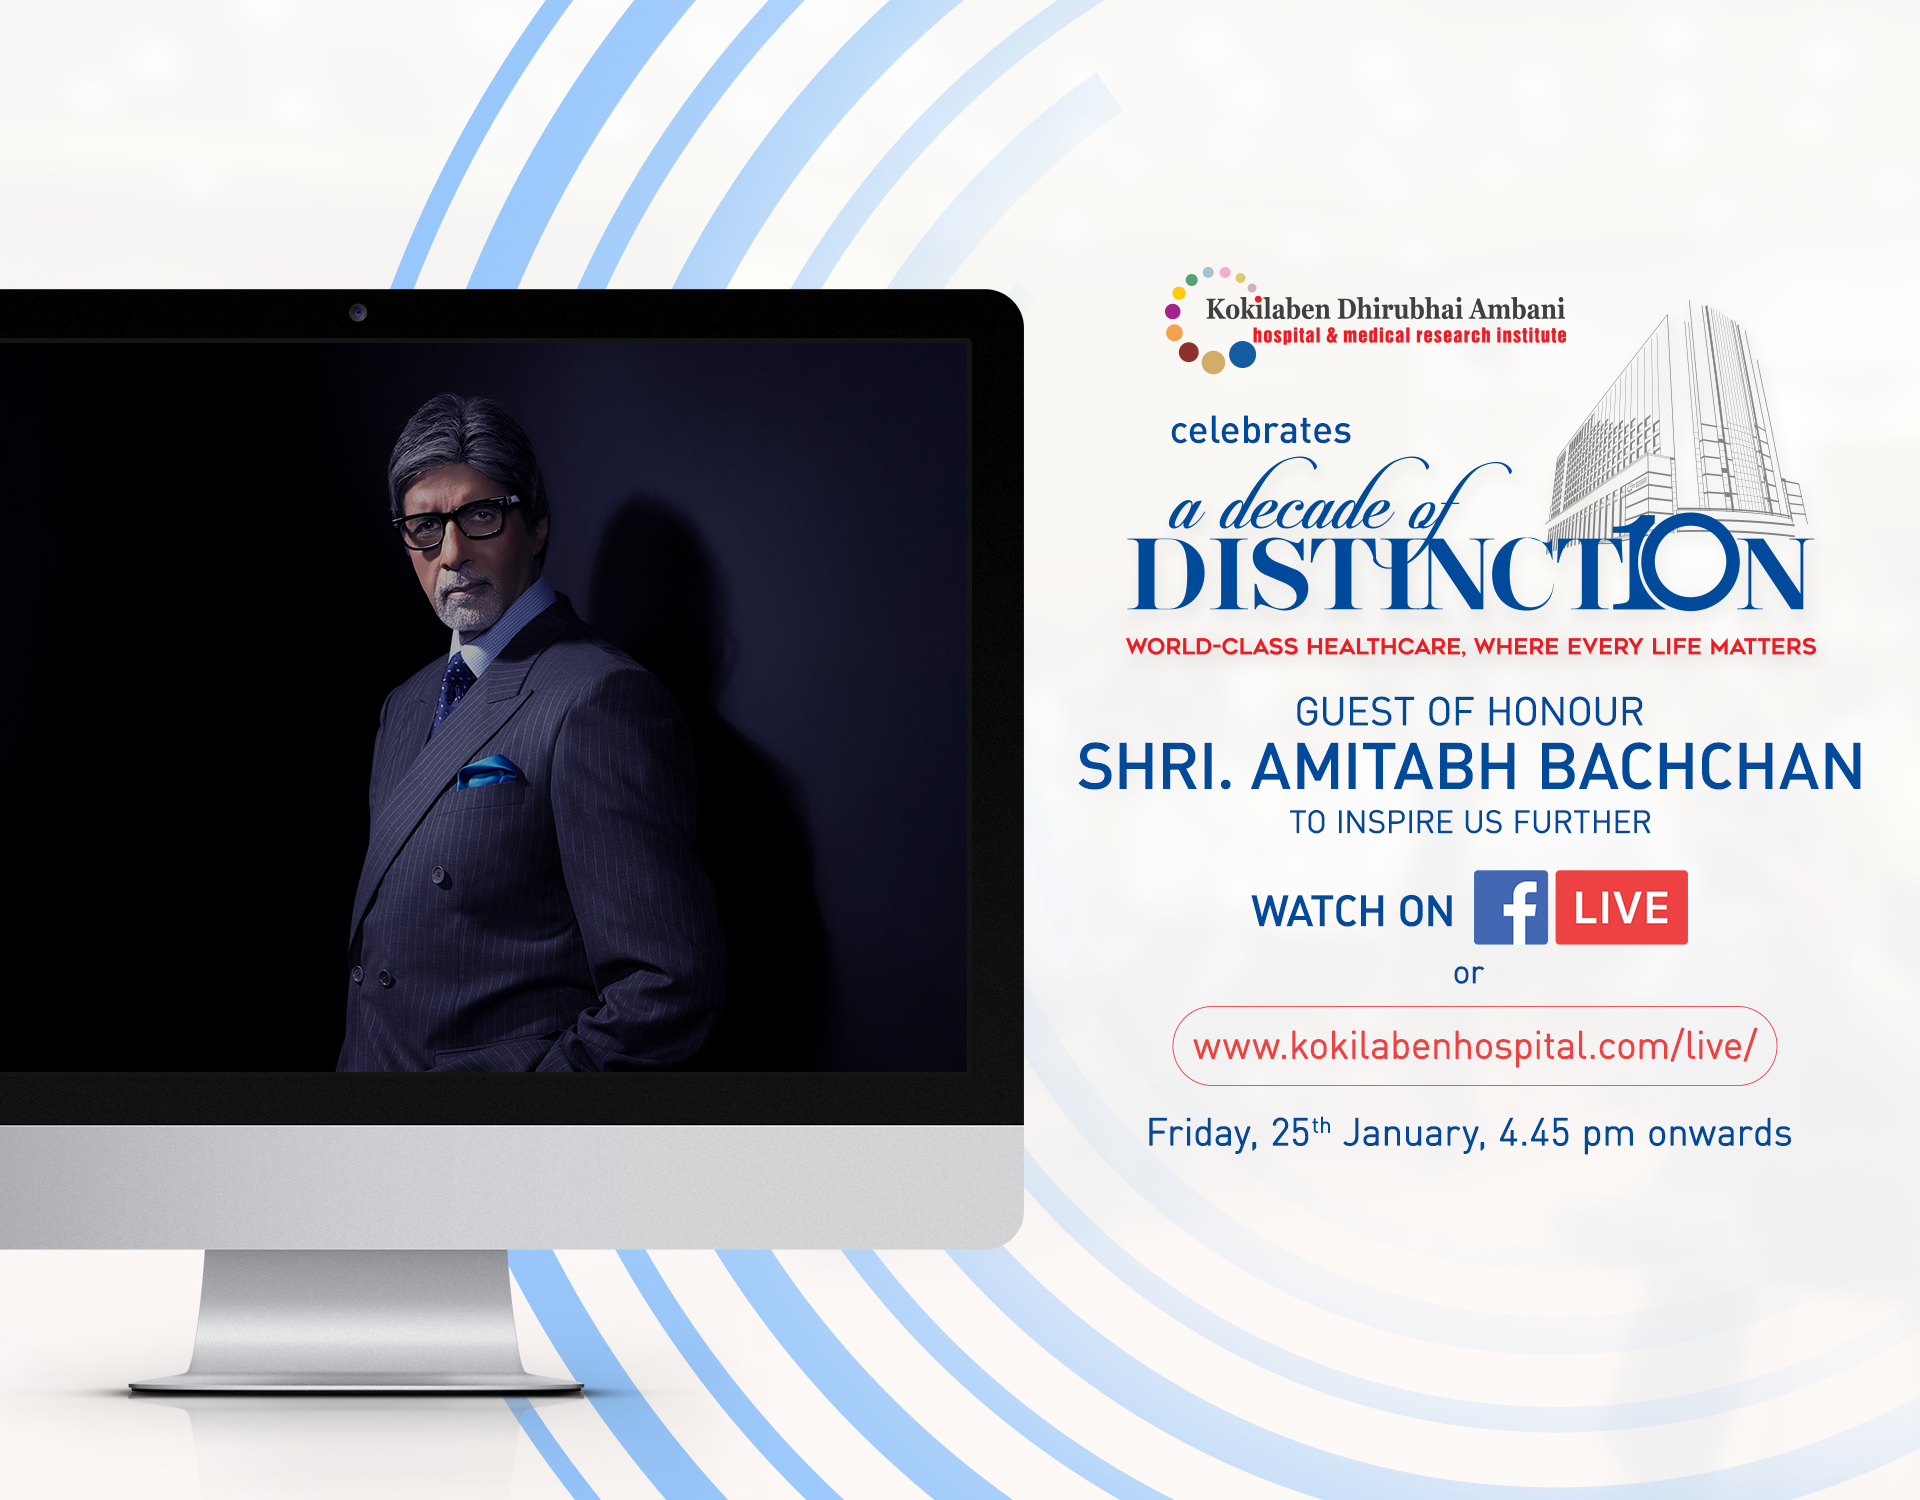 Kokilaben Dhirubhai Ambani Hospital - A Decade of Distinction - Guest of Honour Shri Amitabh Bachchan - To Inspire Us Further